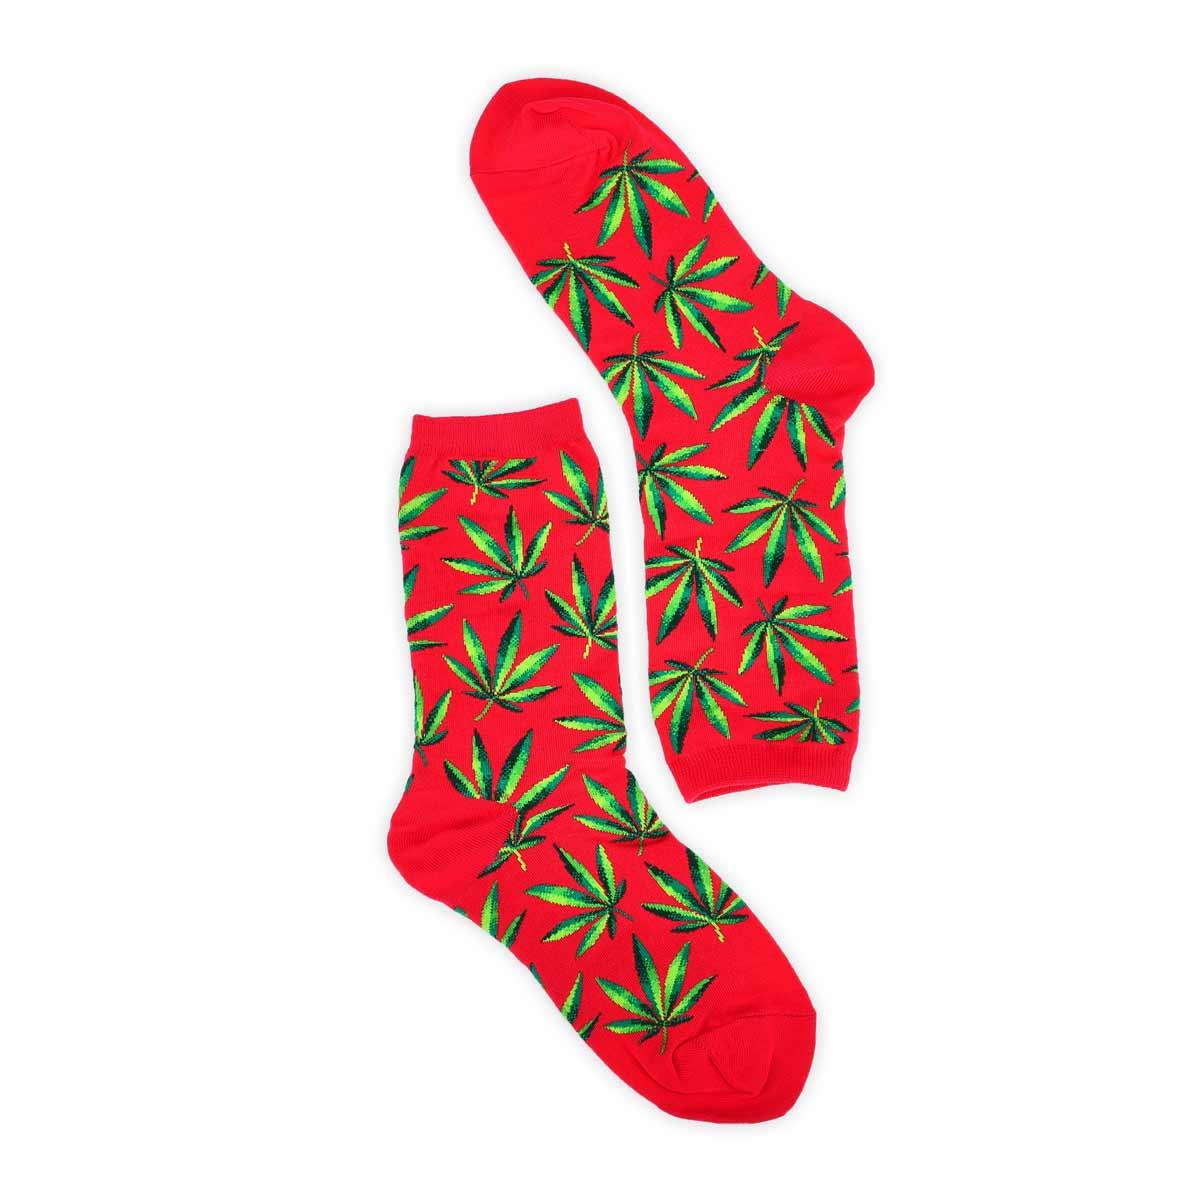 Lds Marijuana hot pink printed sock